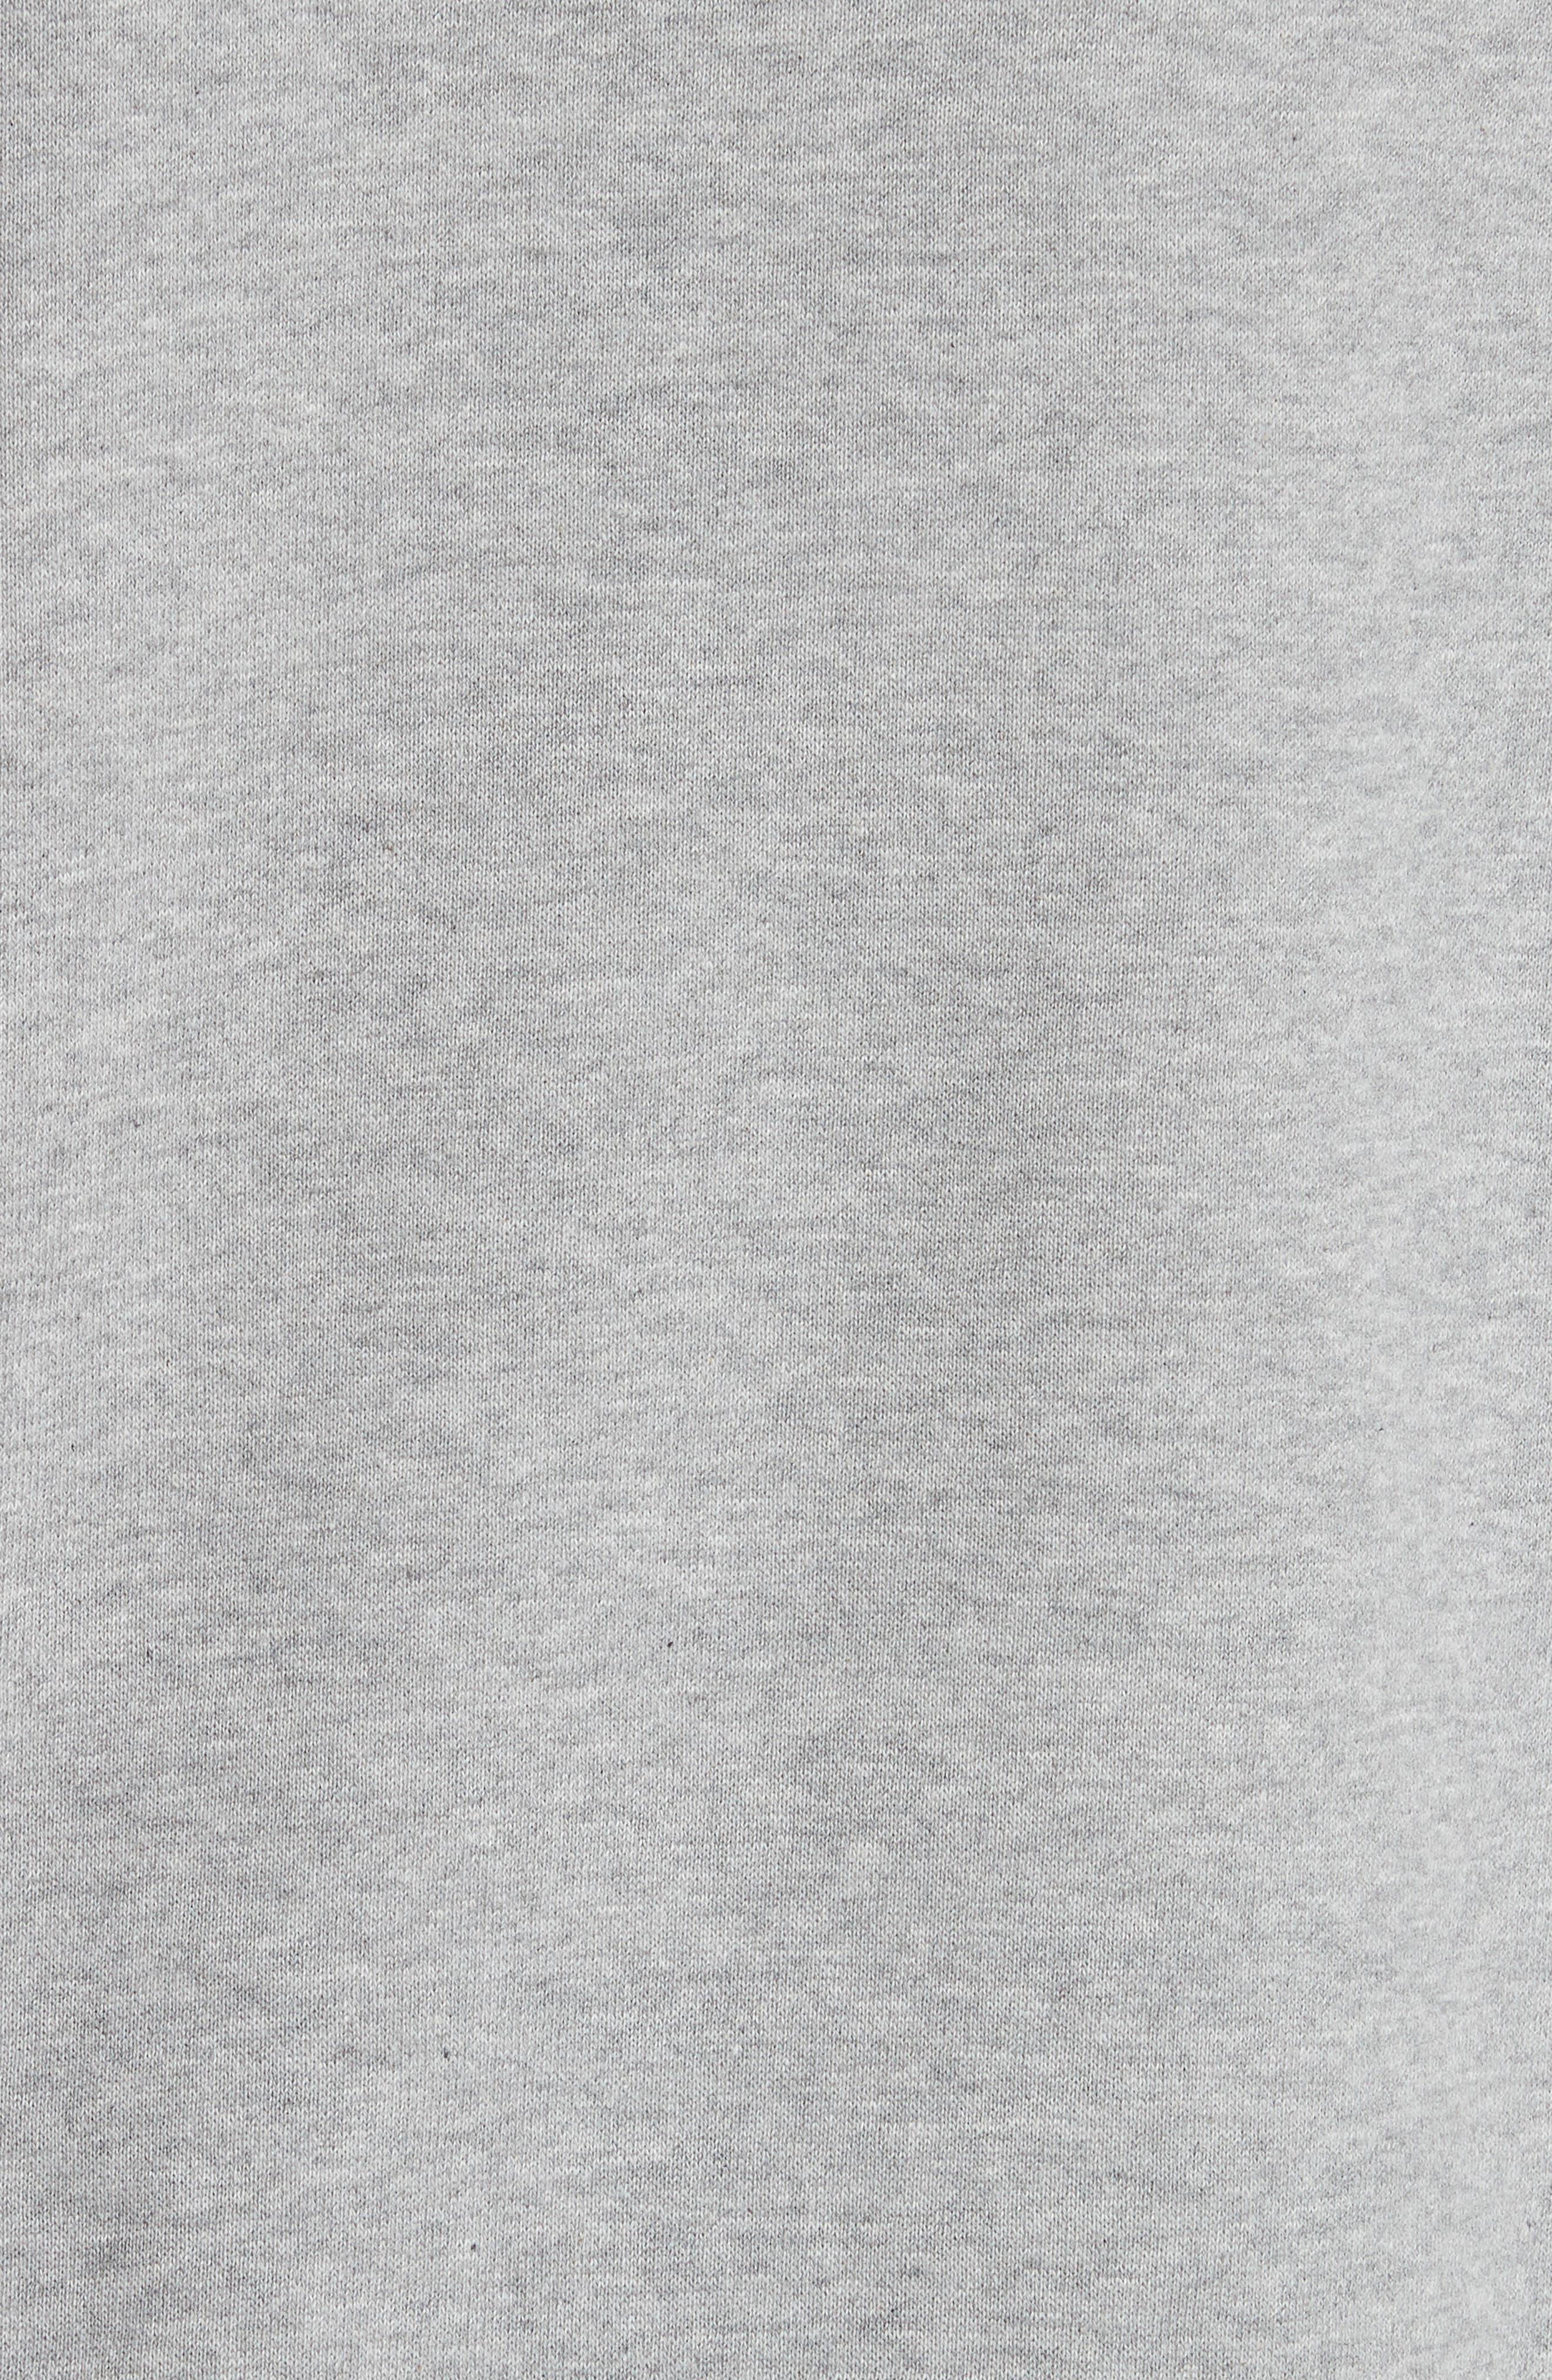 Brooke Shields Patch Sweatshirt,                             Alternate thumbnail 5, color,                             Grey